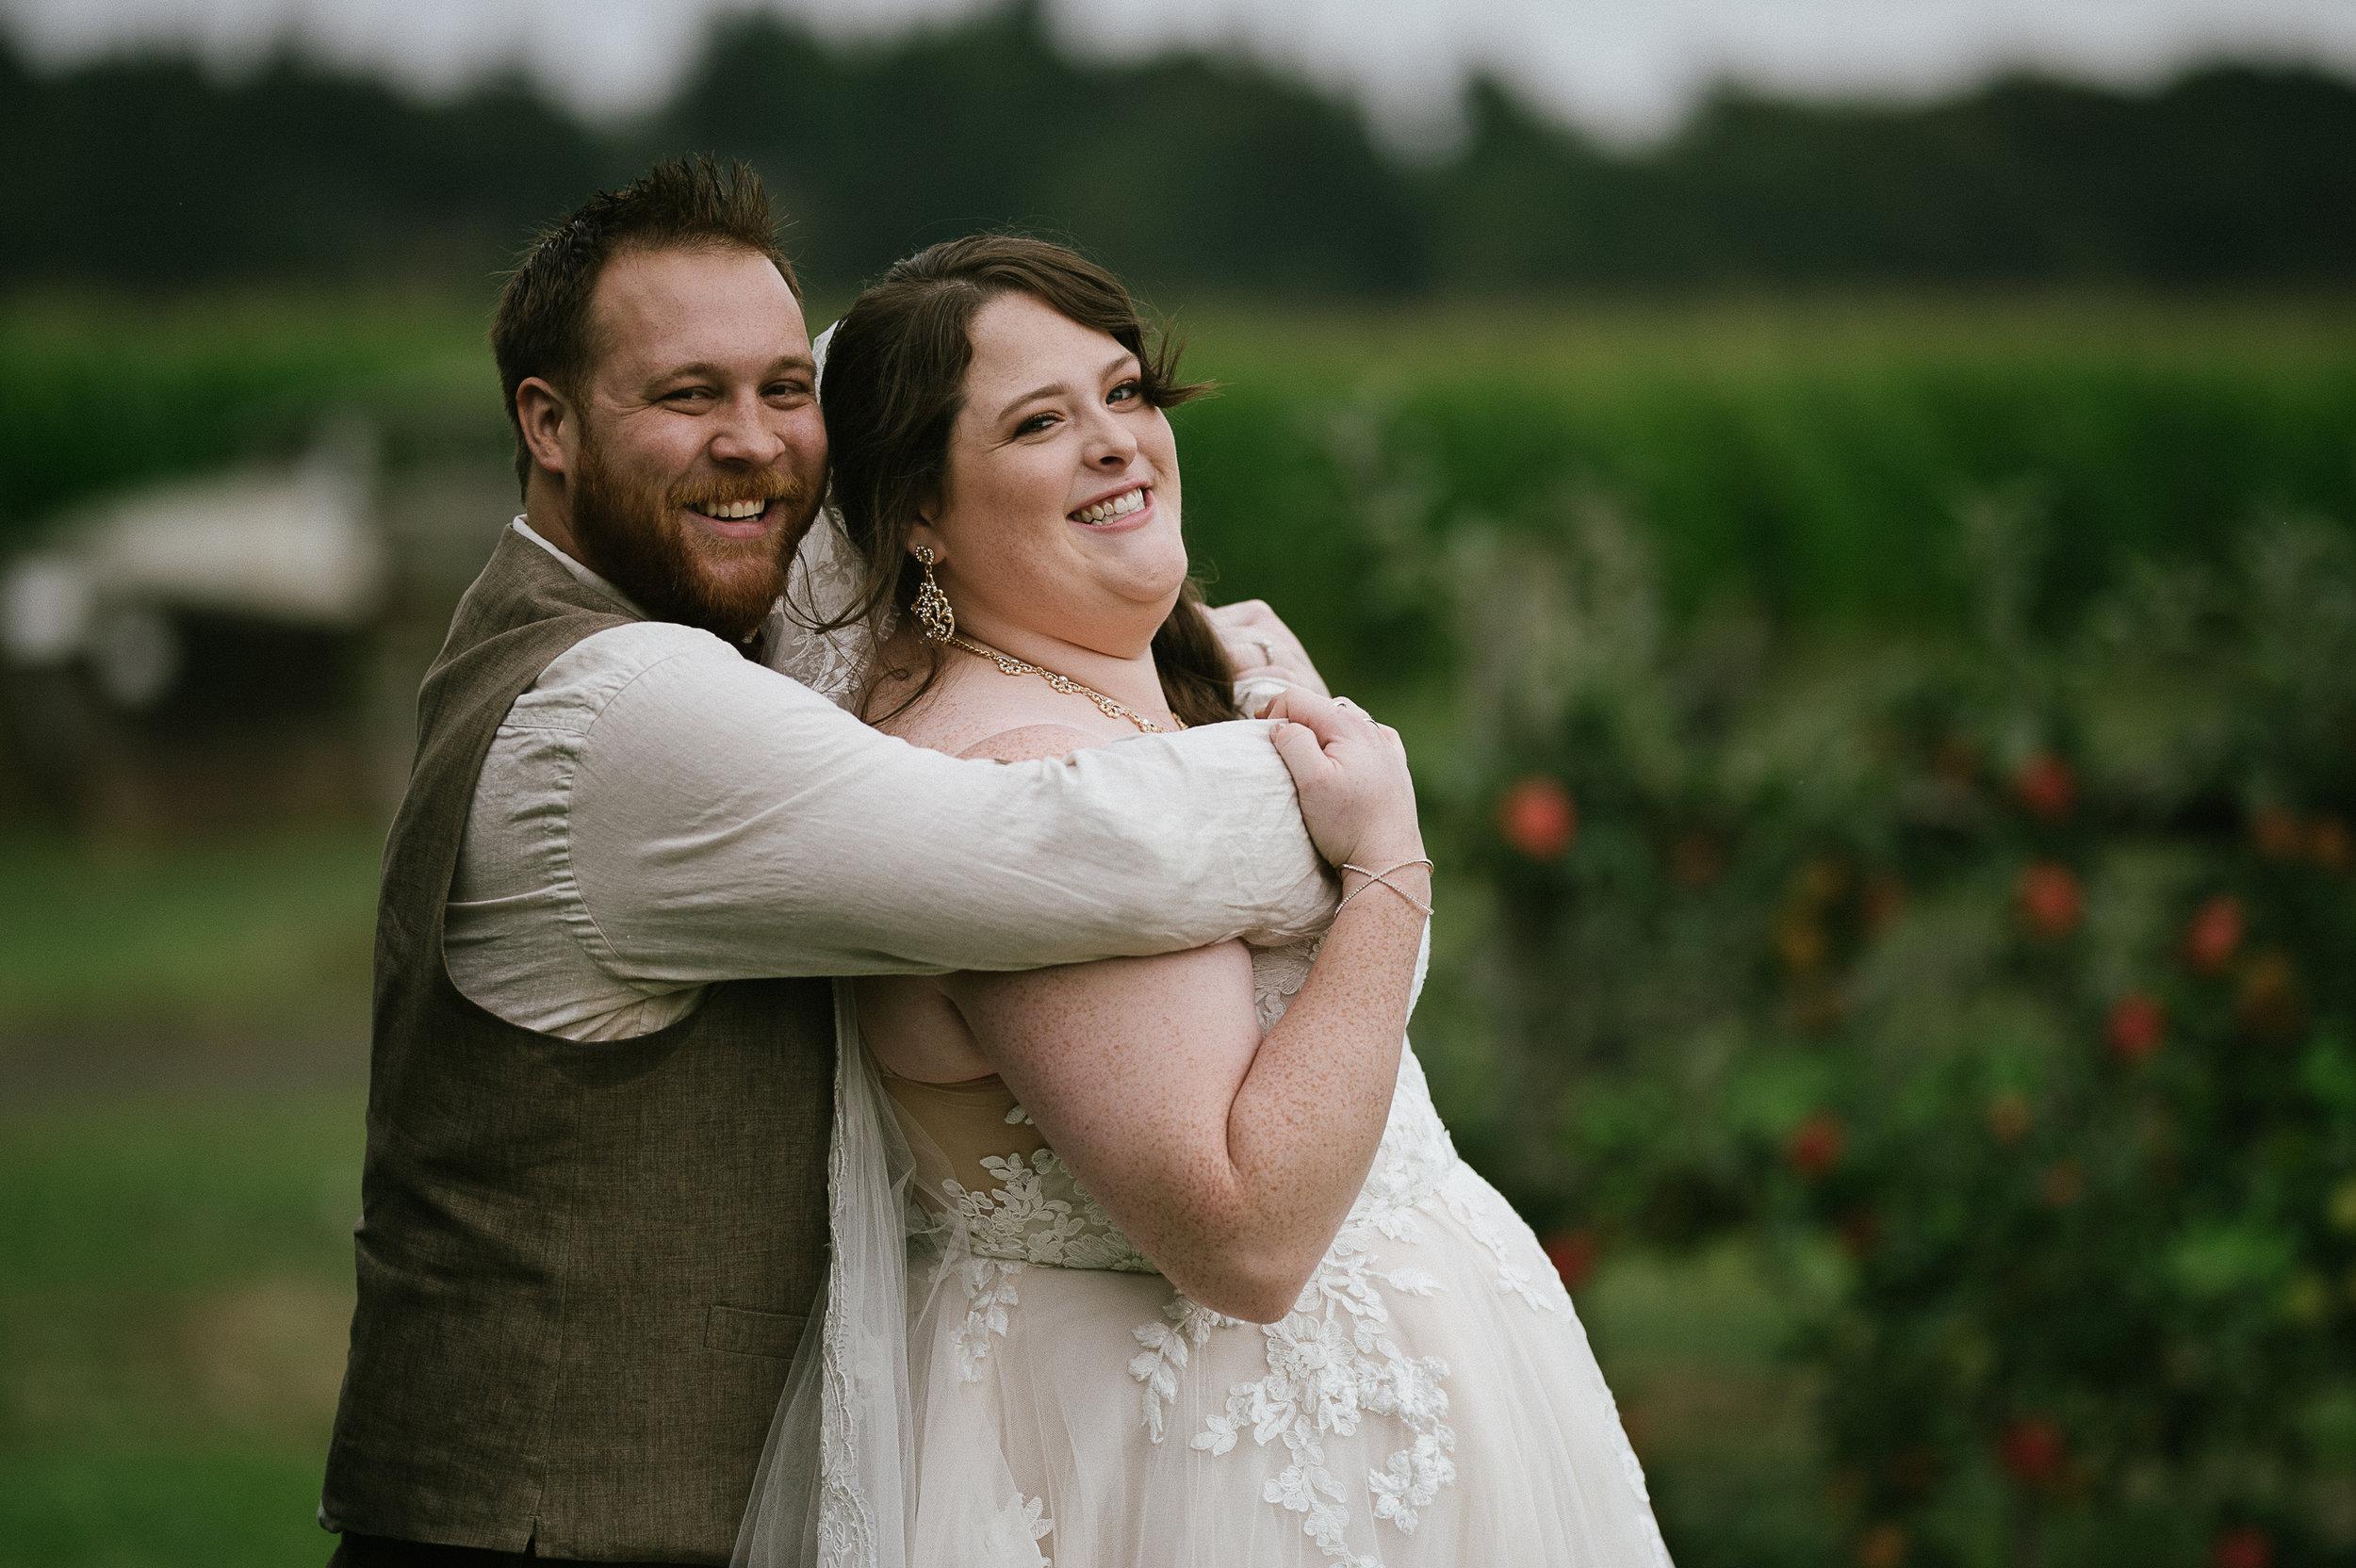 Swan Trail Farm Wedding_Sarah Schurman + Brian Skadan_Snohomish Wedding_Kelsey Lane Photography-5783.jpg